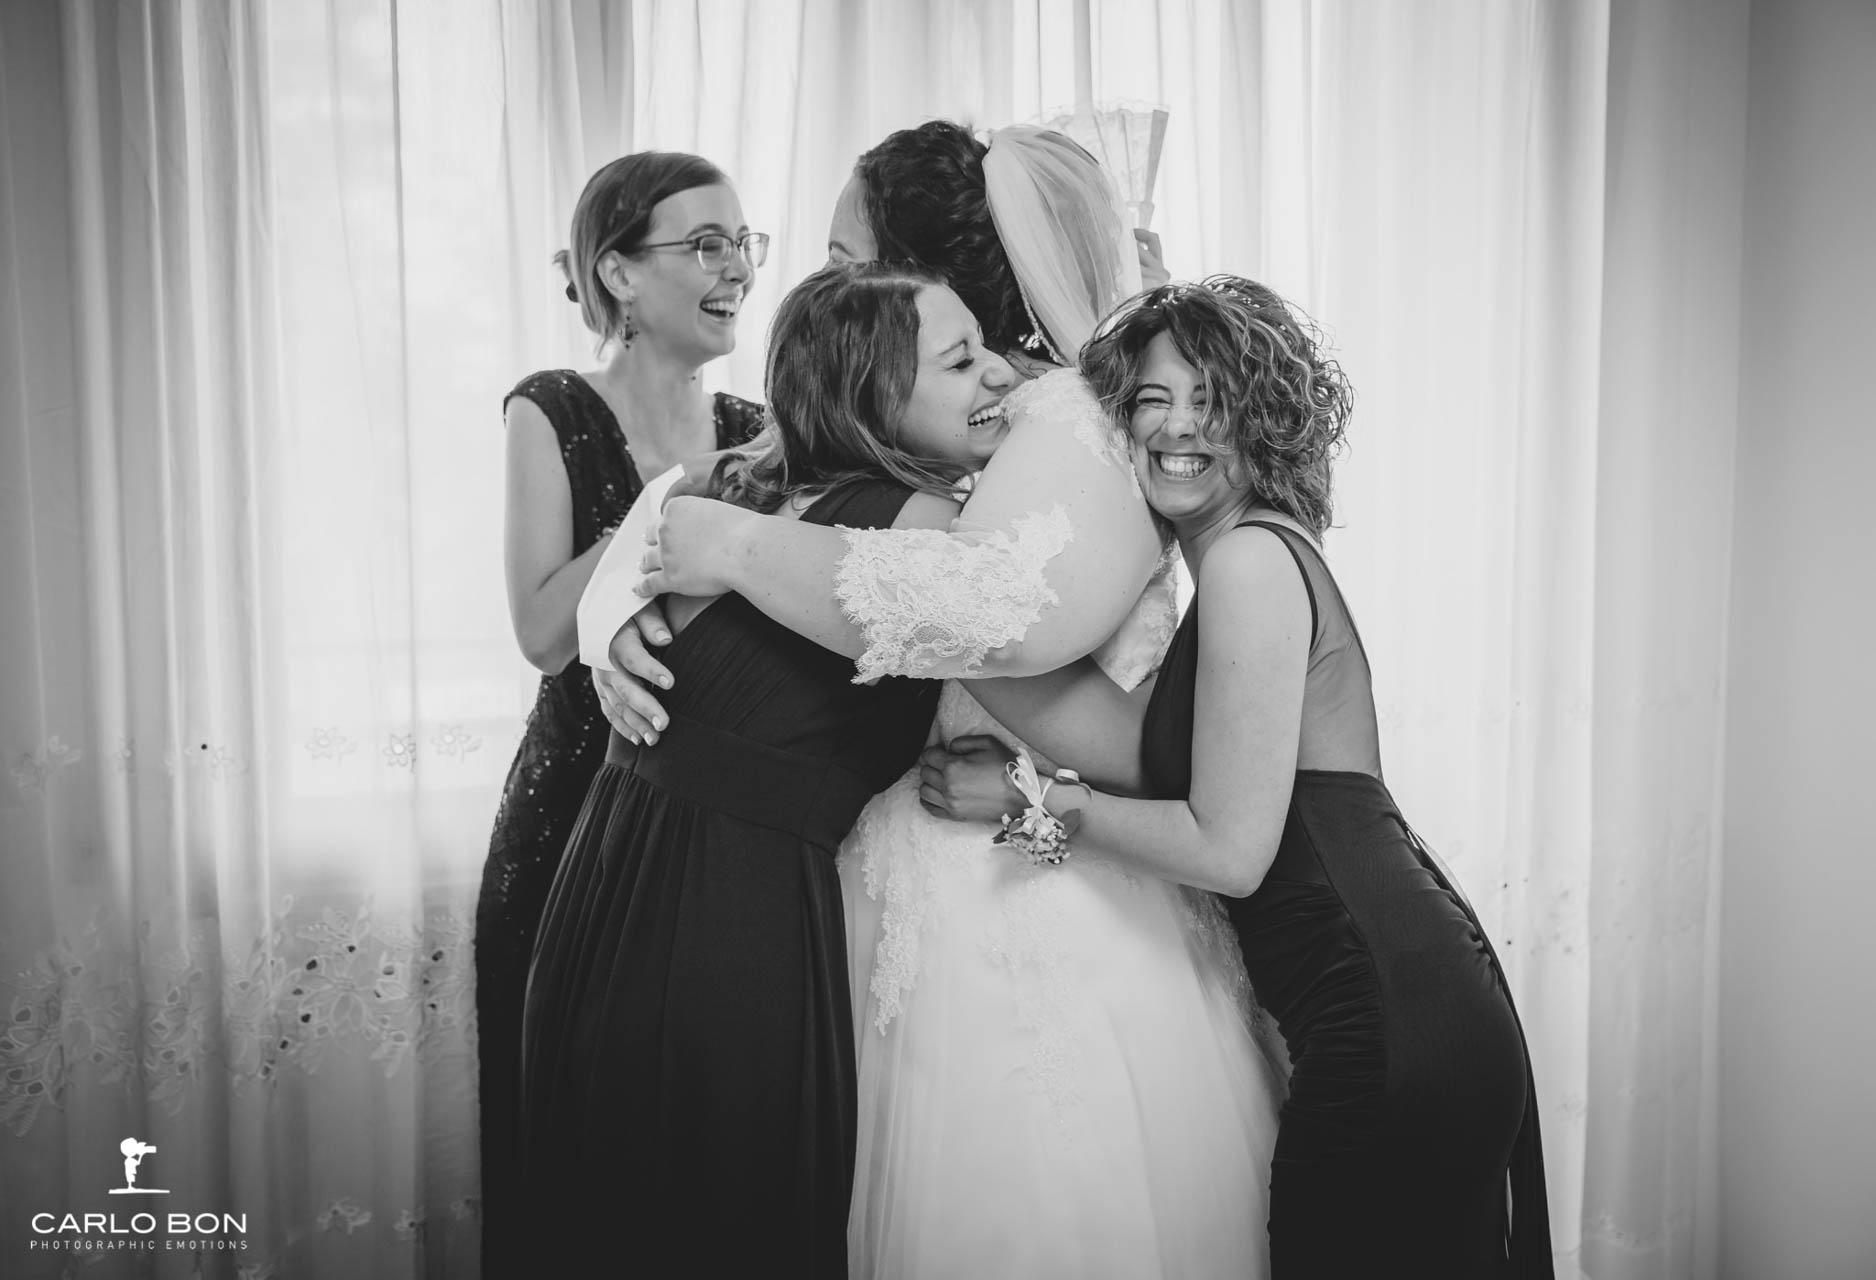 Matrimonio Silvia e Edoardo - Un Nastrino a pois weddings planner Veneto